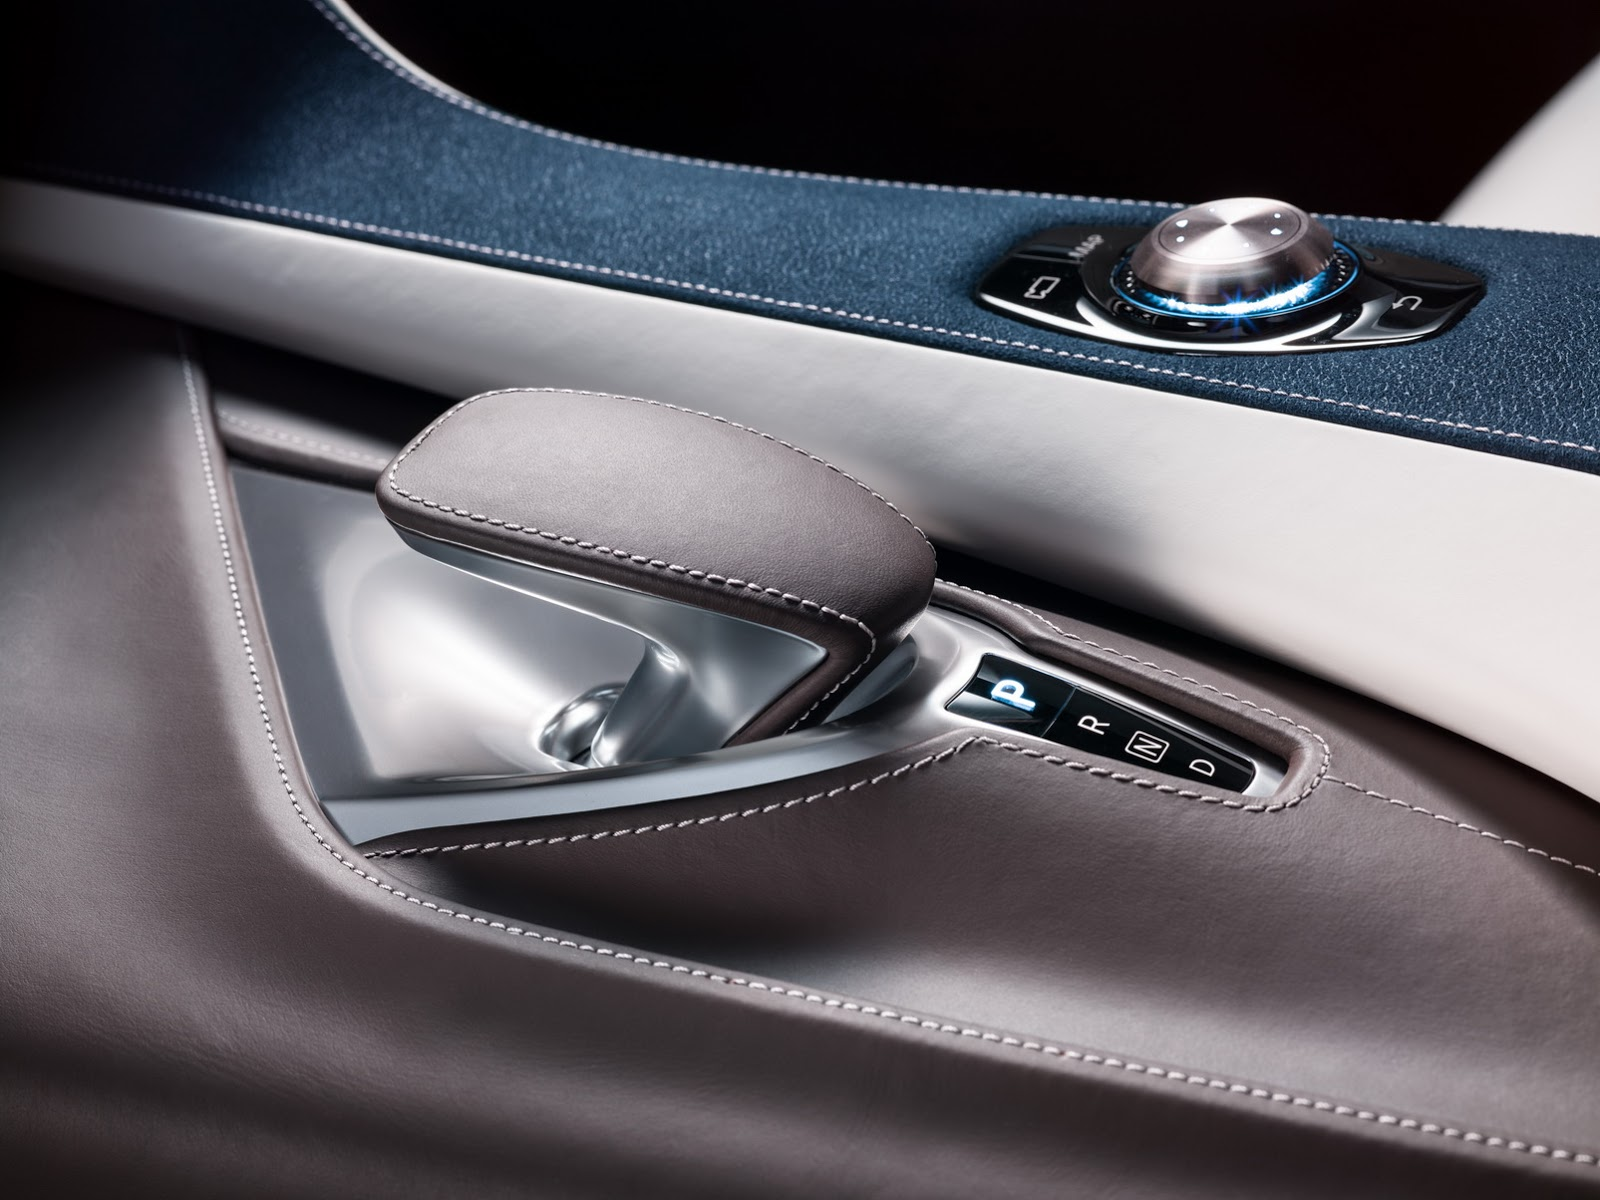 إنفينيتي تعلن عن QX50 كونسيبت بمعرض ديترويت Infinity Infiniti-qx50-concept-arrives-detroit-12